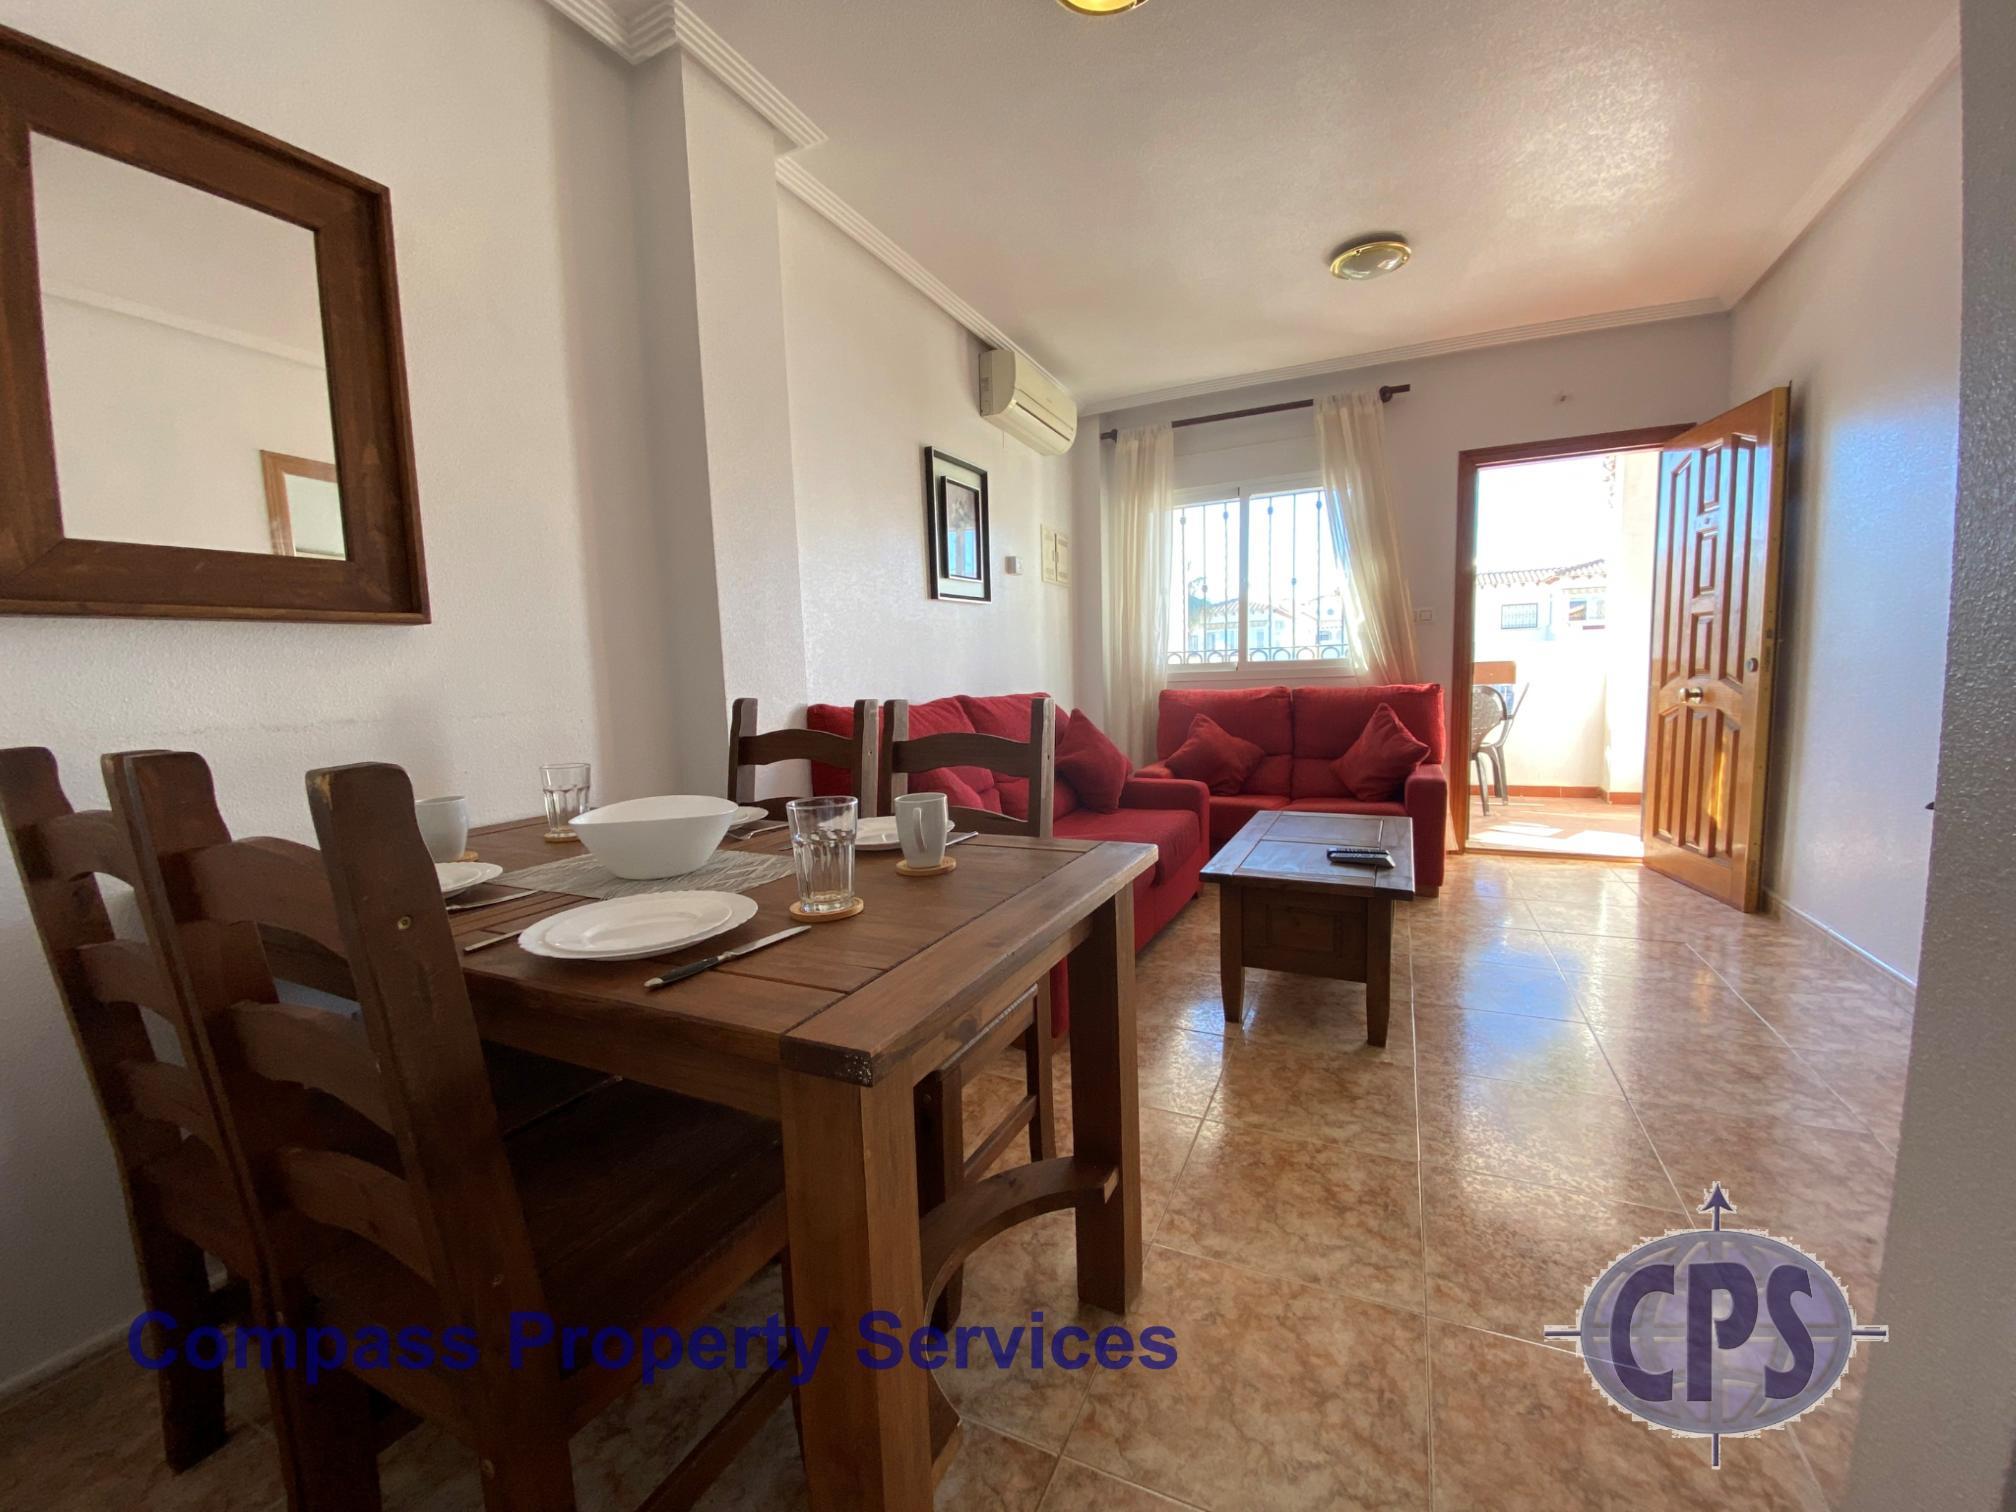 Apartment La Cinuelica R3 1st flr apt overlooking pool l149 photo 28556774